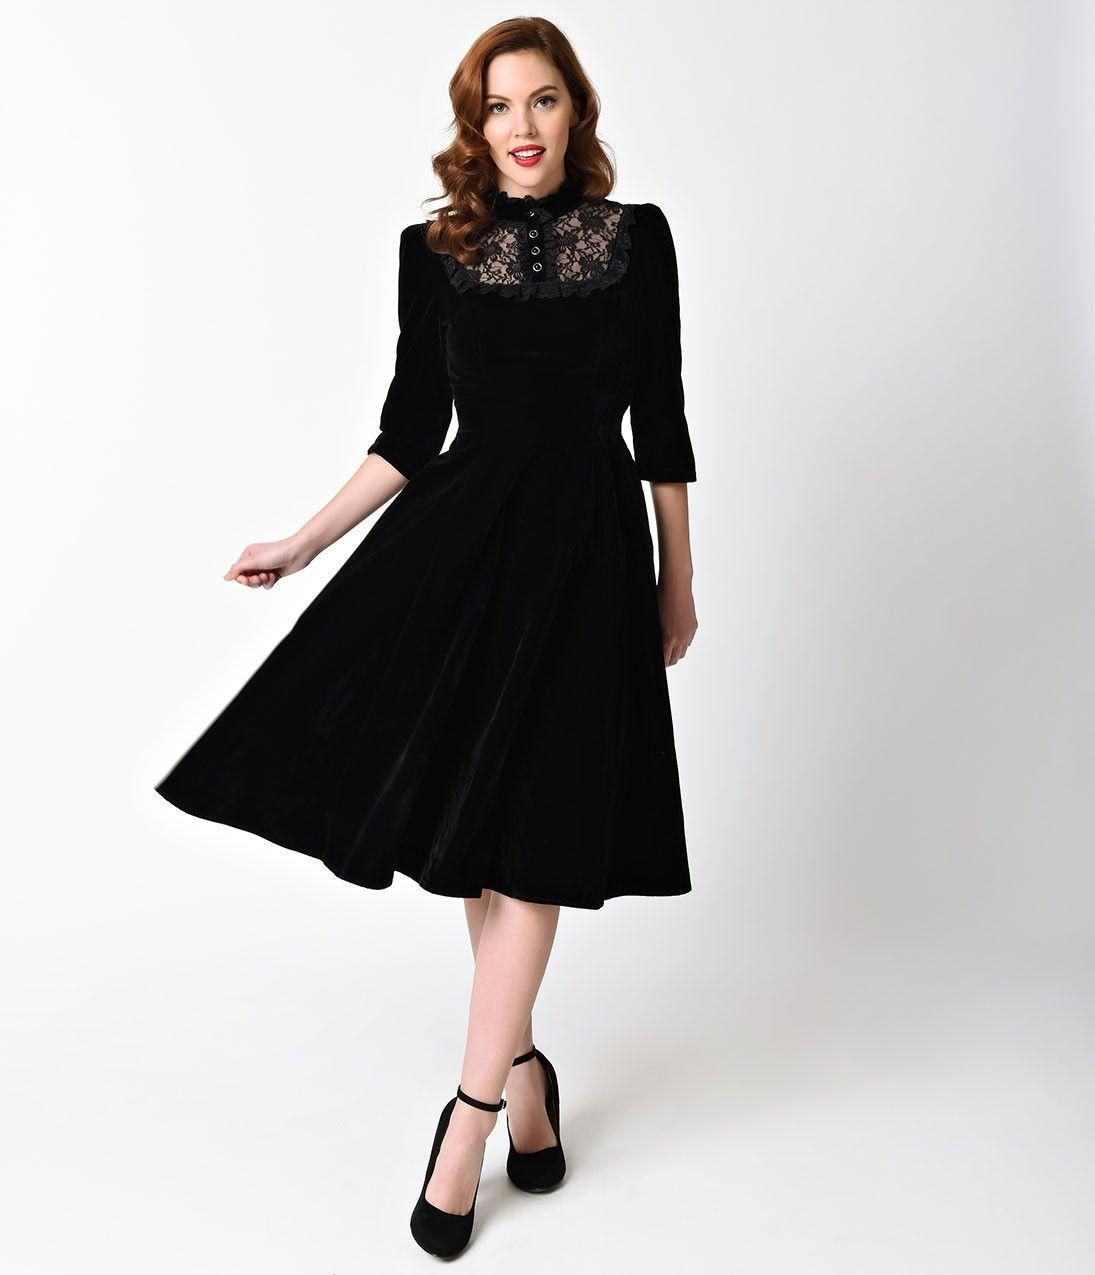 Vintage Style Black Velvet Lace Nightshade Half Sleeve Swing Dress Black Cocktail Dress Sleeved Swing Dress Dresses [ 1275 x 1095 Pixel ]